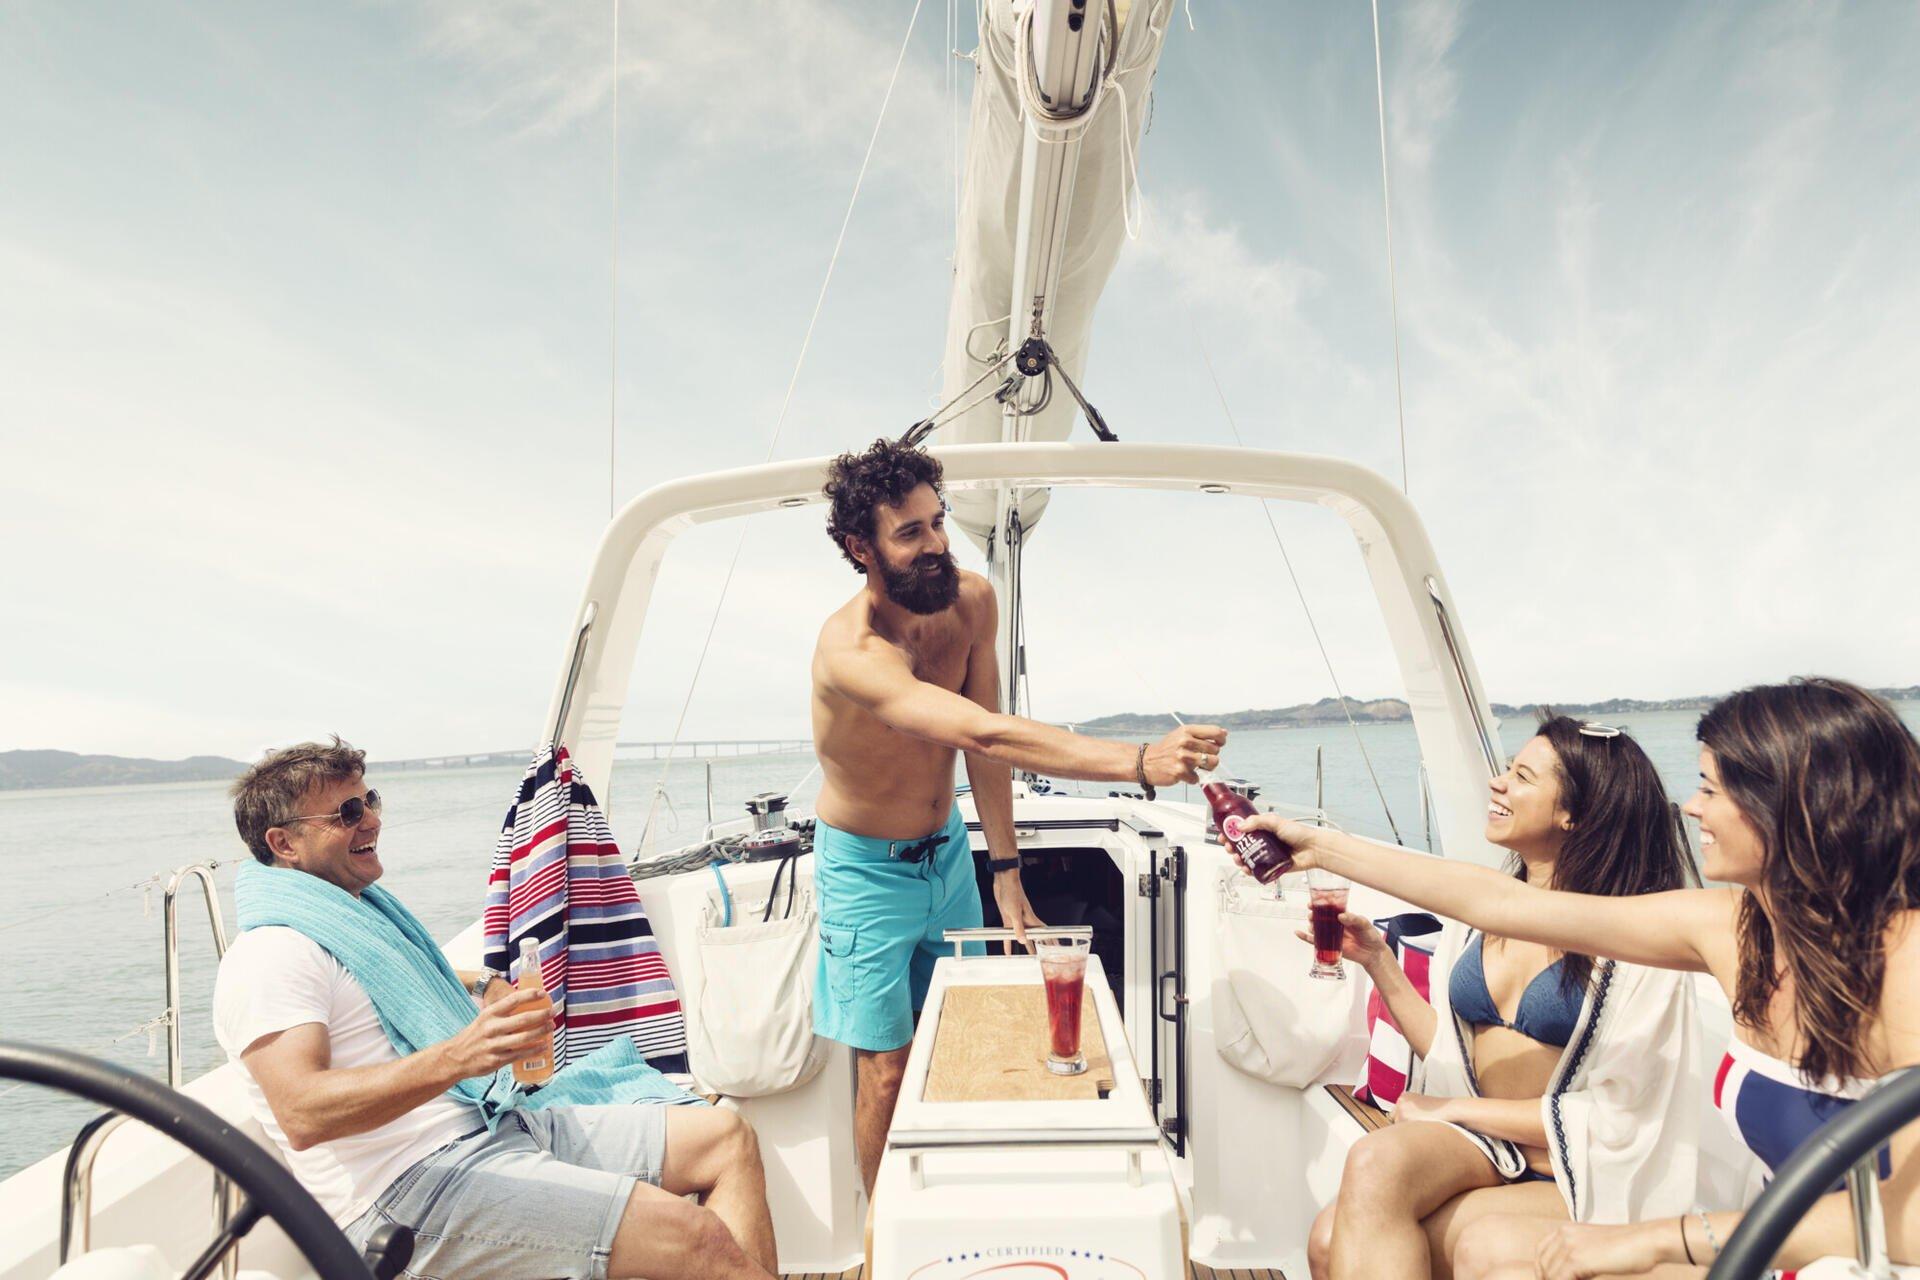 Dometic marine sailboat drinks refrigerator